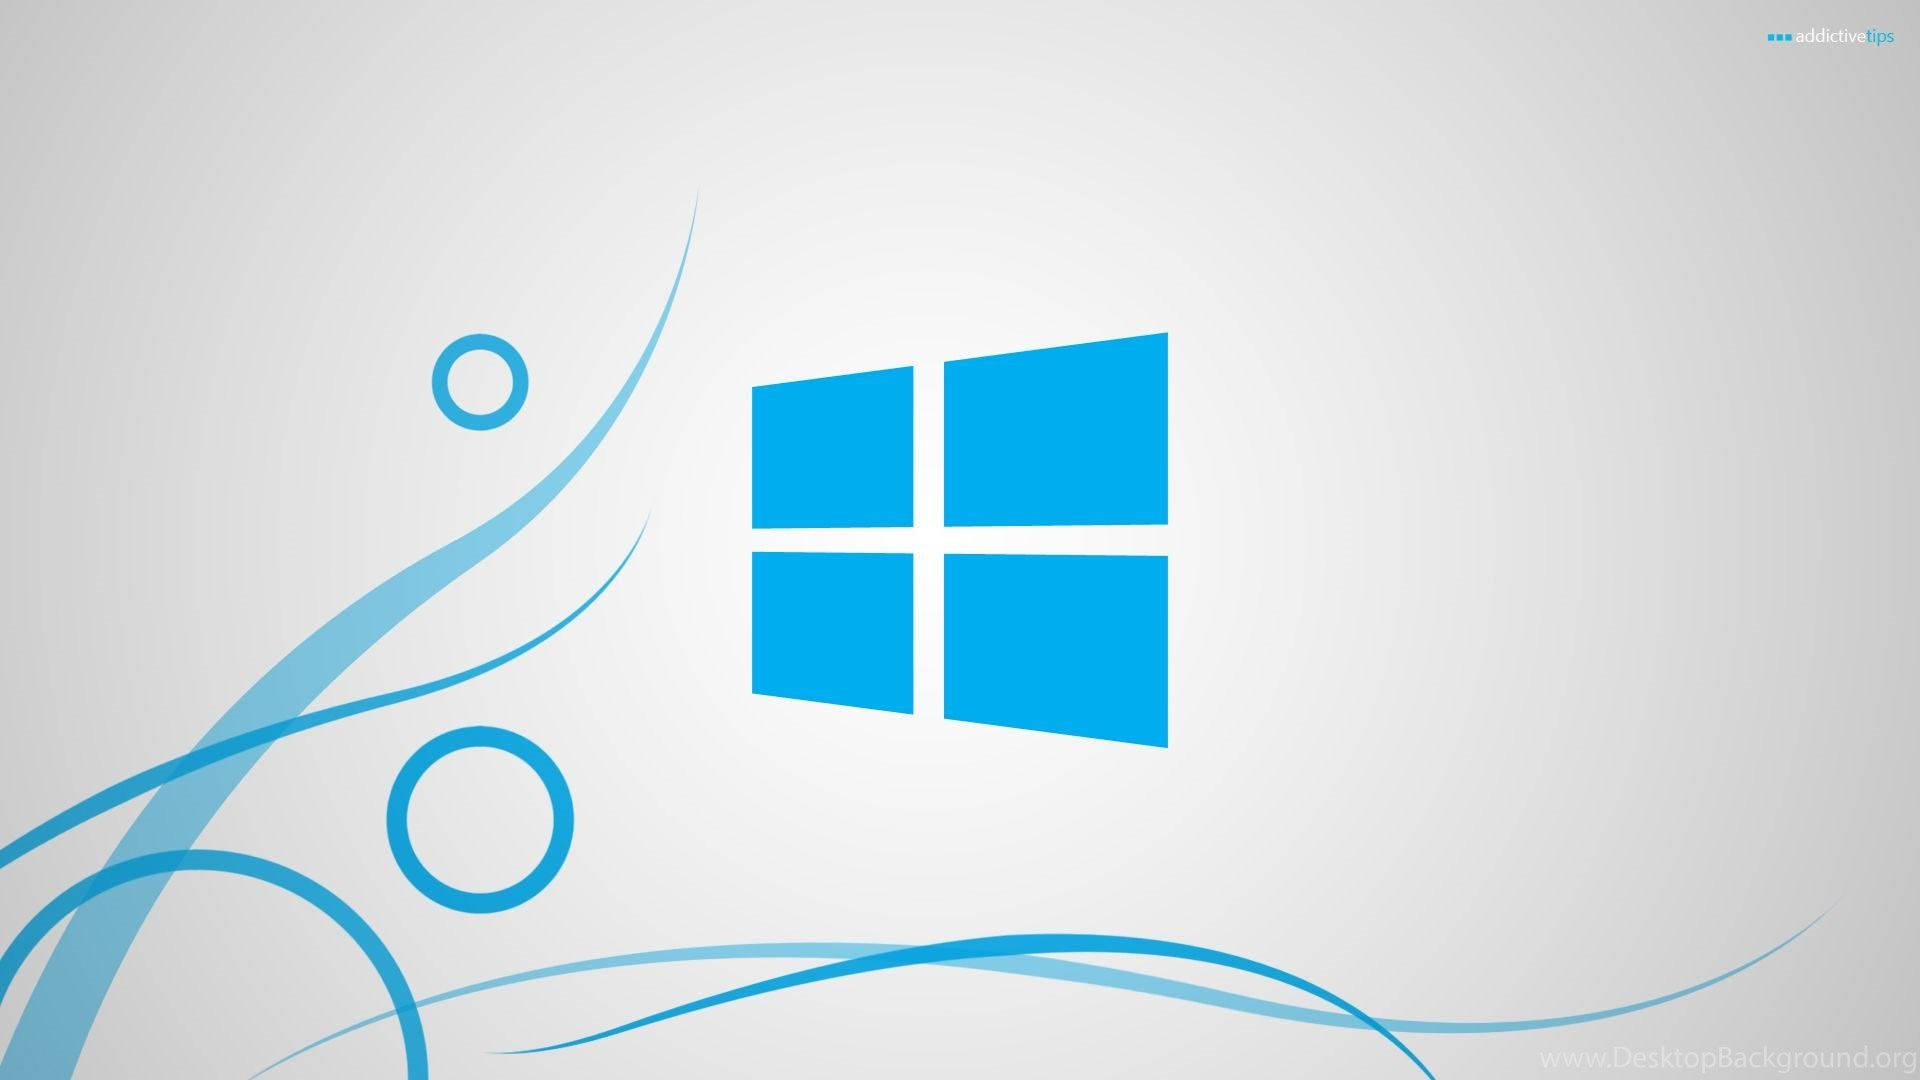 Windows 8 Hd Wallpapers Toptenpack Com Desktop Background